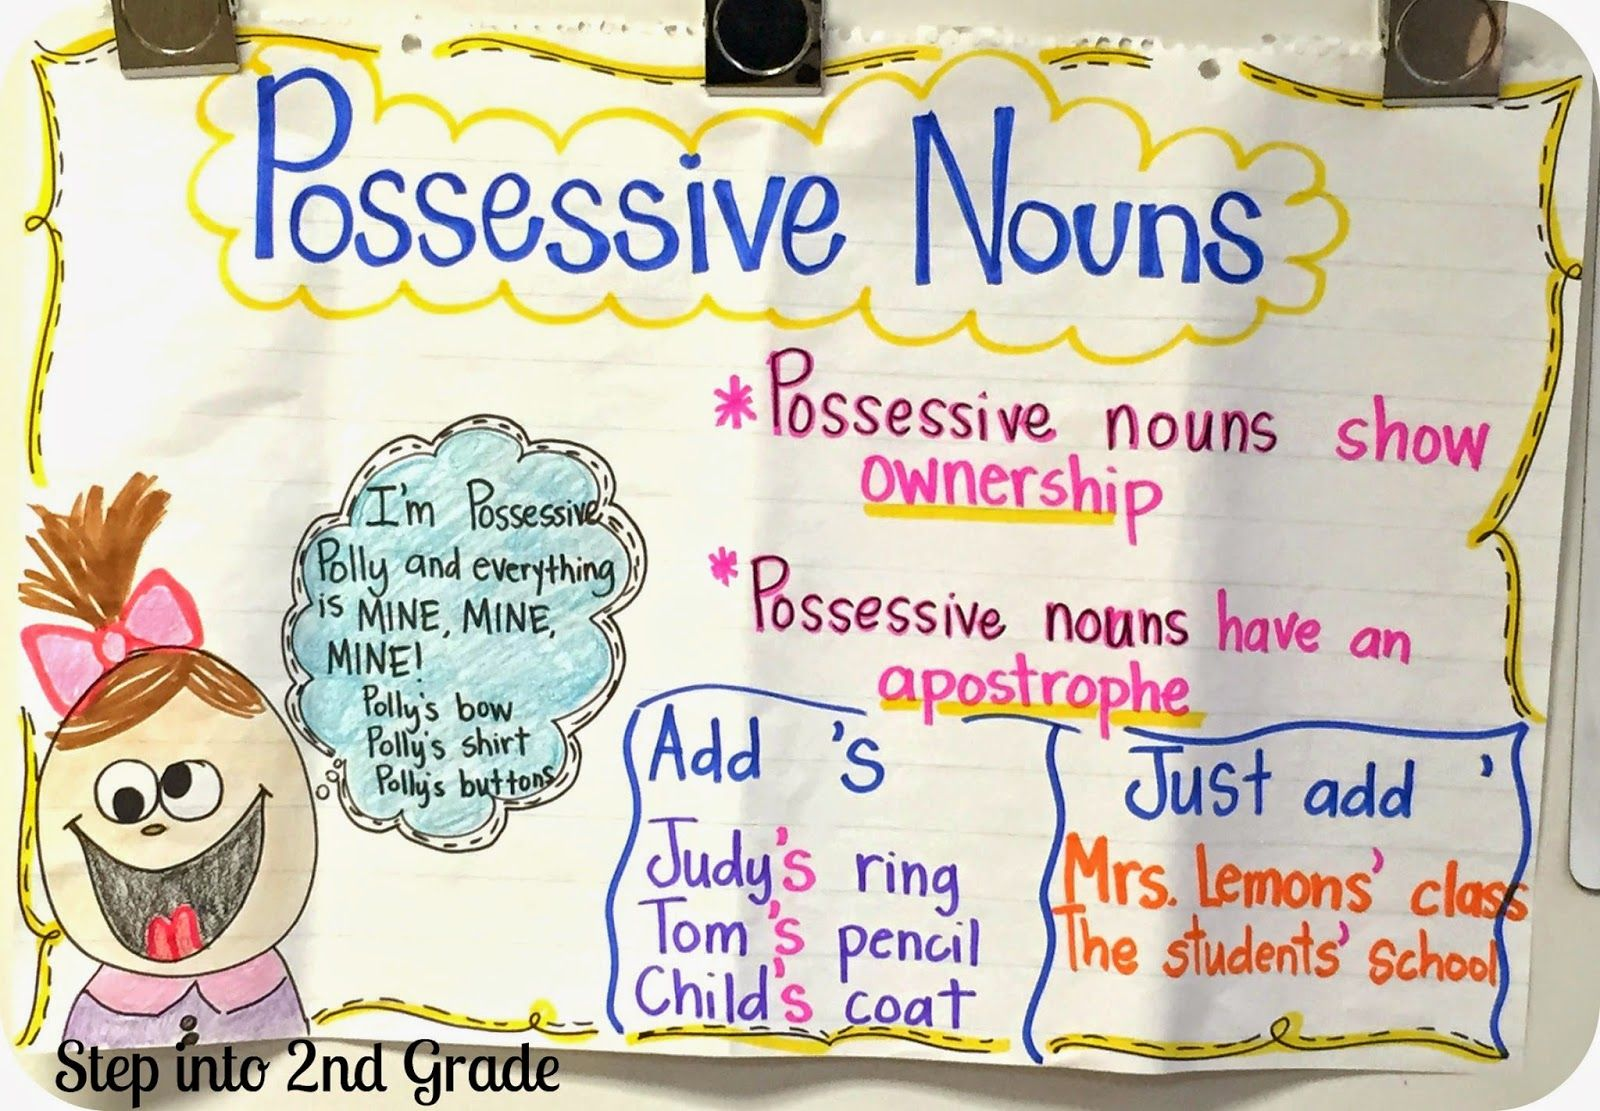 medium resolution of Possessive Nouns (Step into 2nd Grade with Mrs. Lemons)   Possessive nouns